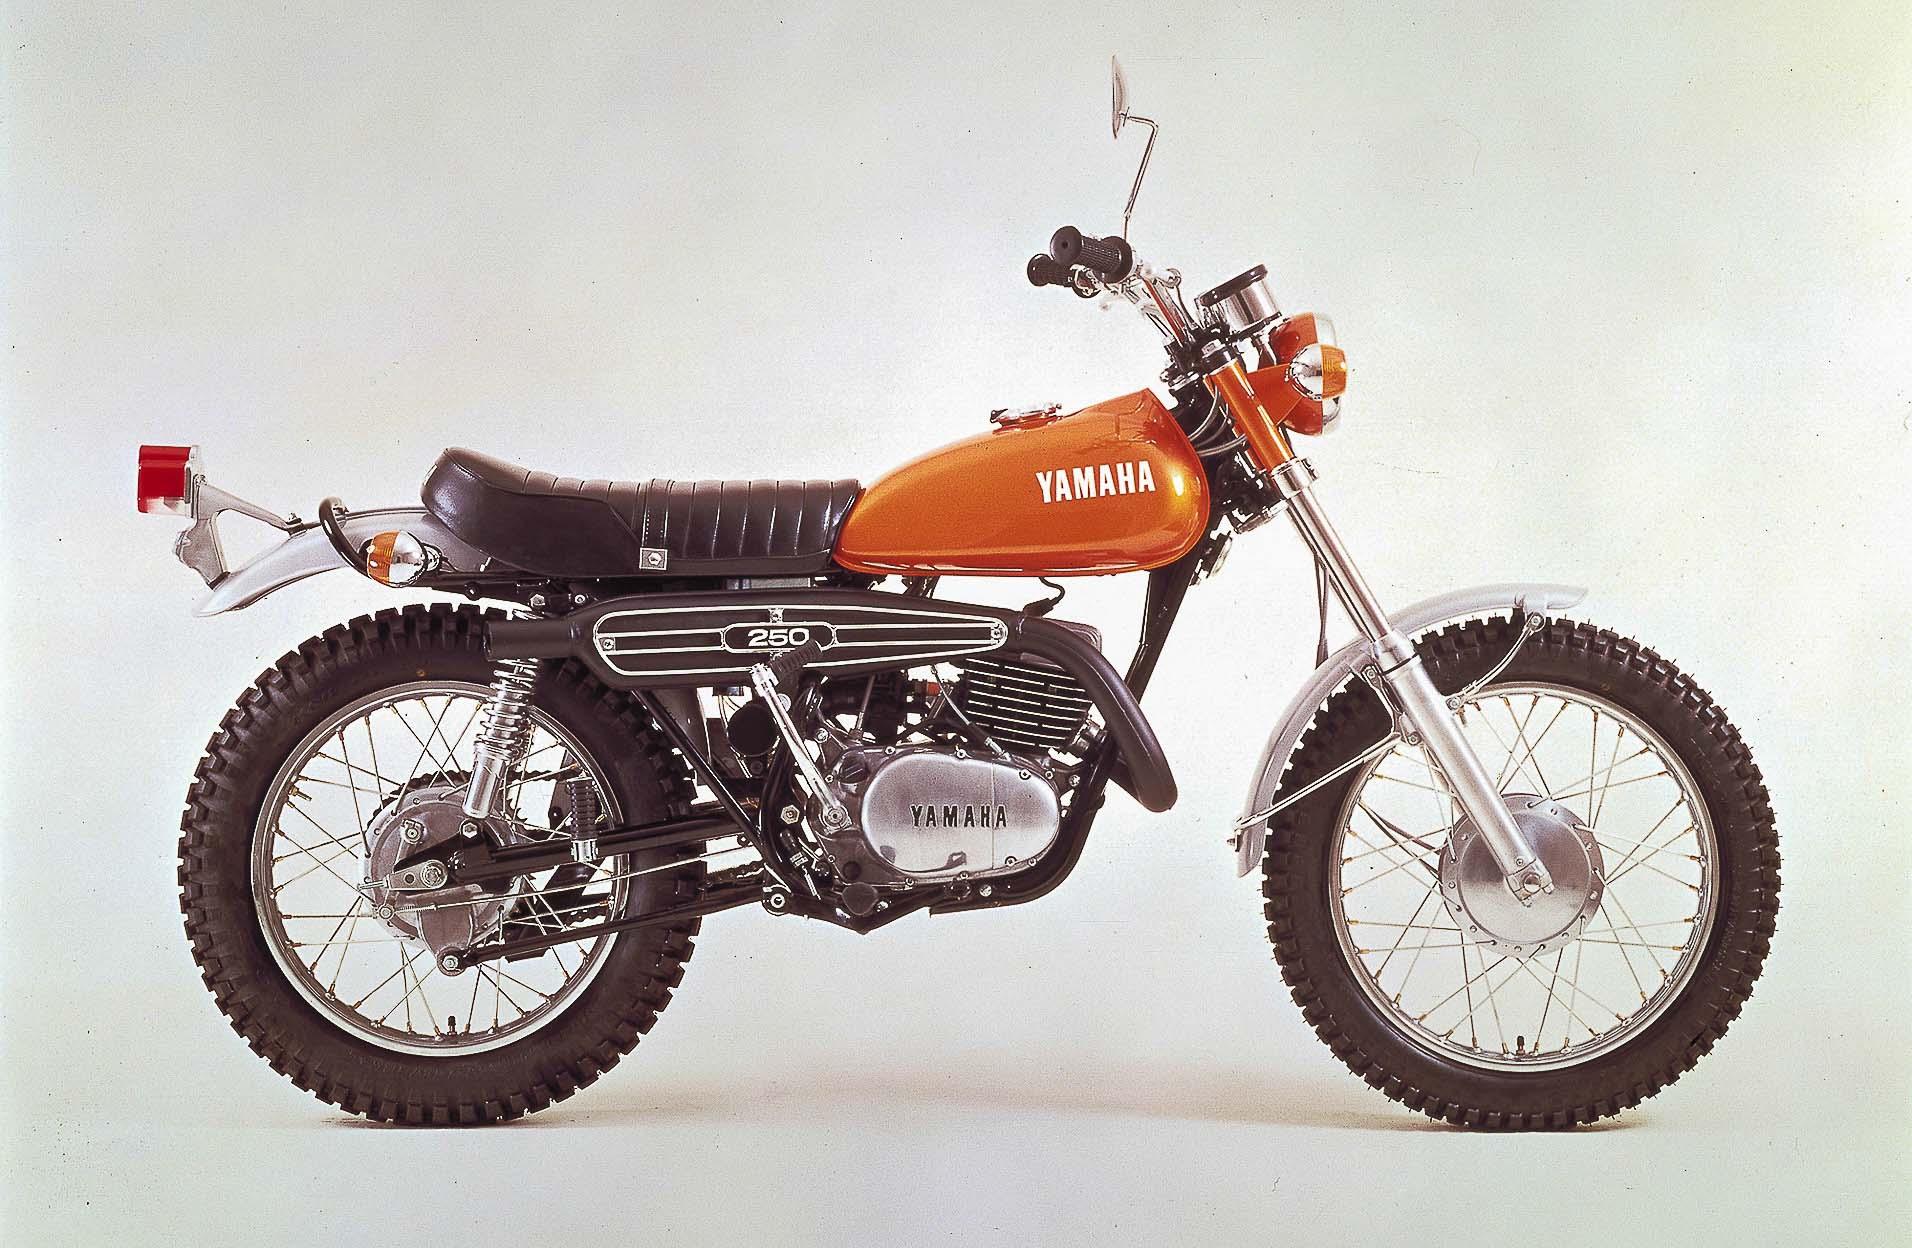 YAMAHA DT 250 (1968 - 1976)